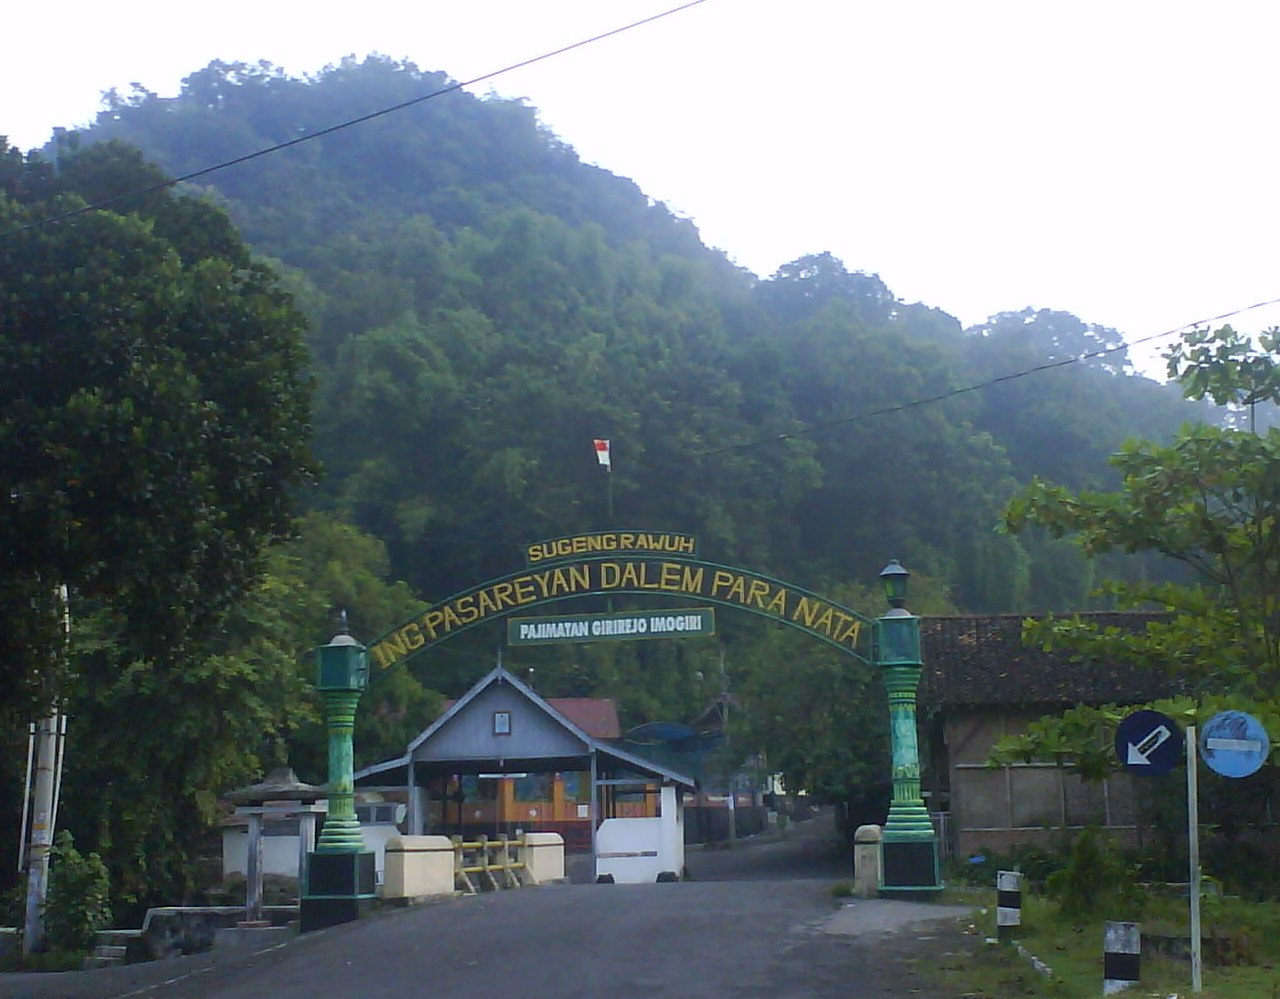 Makam Raja Imogiri Mataram Sultan Sunan Kab Bantul